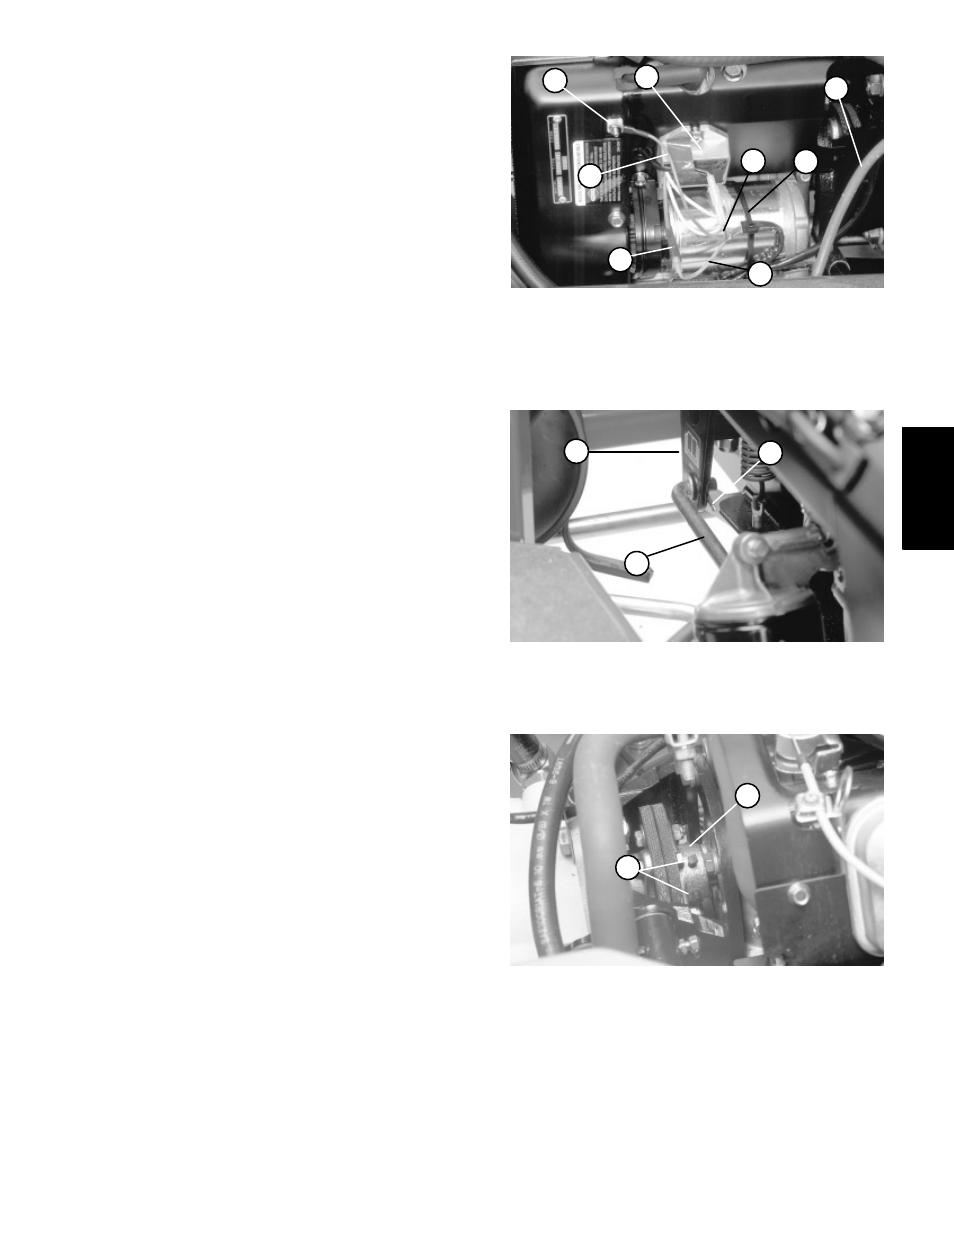 toro sand pro 5020 user manual | page 43 / 170